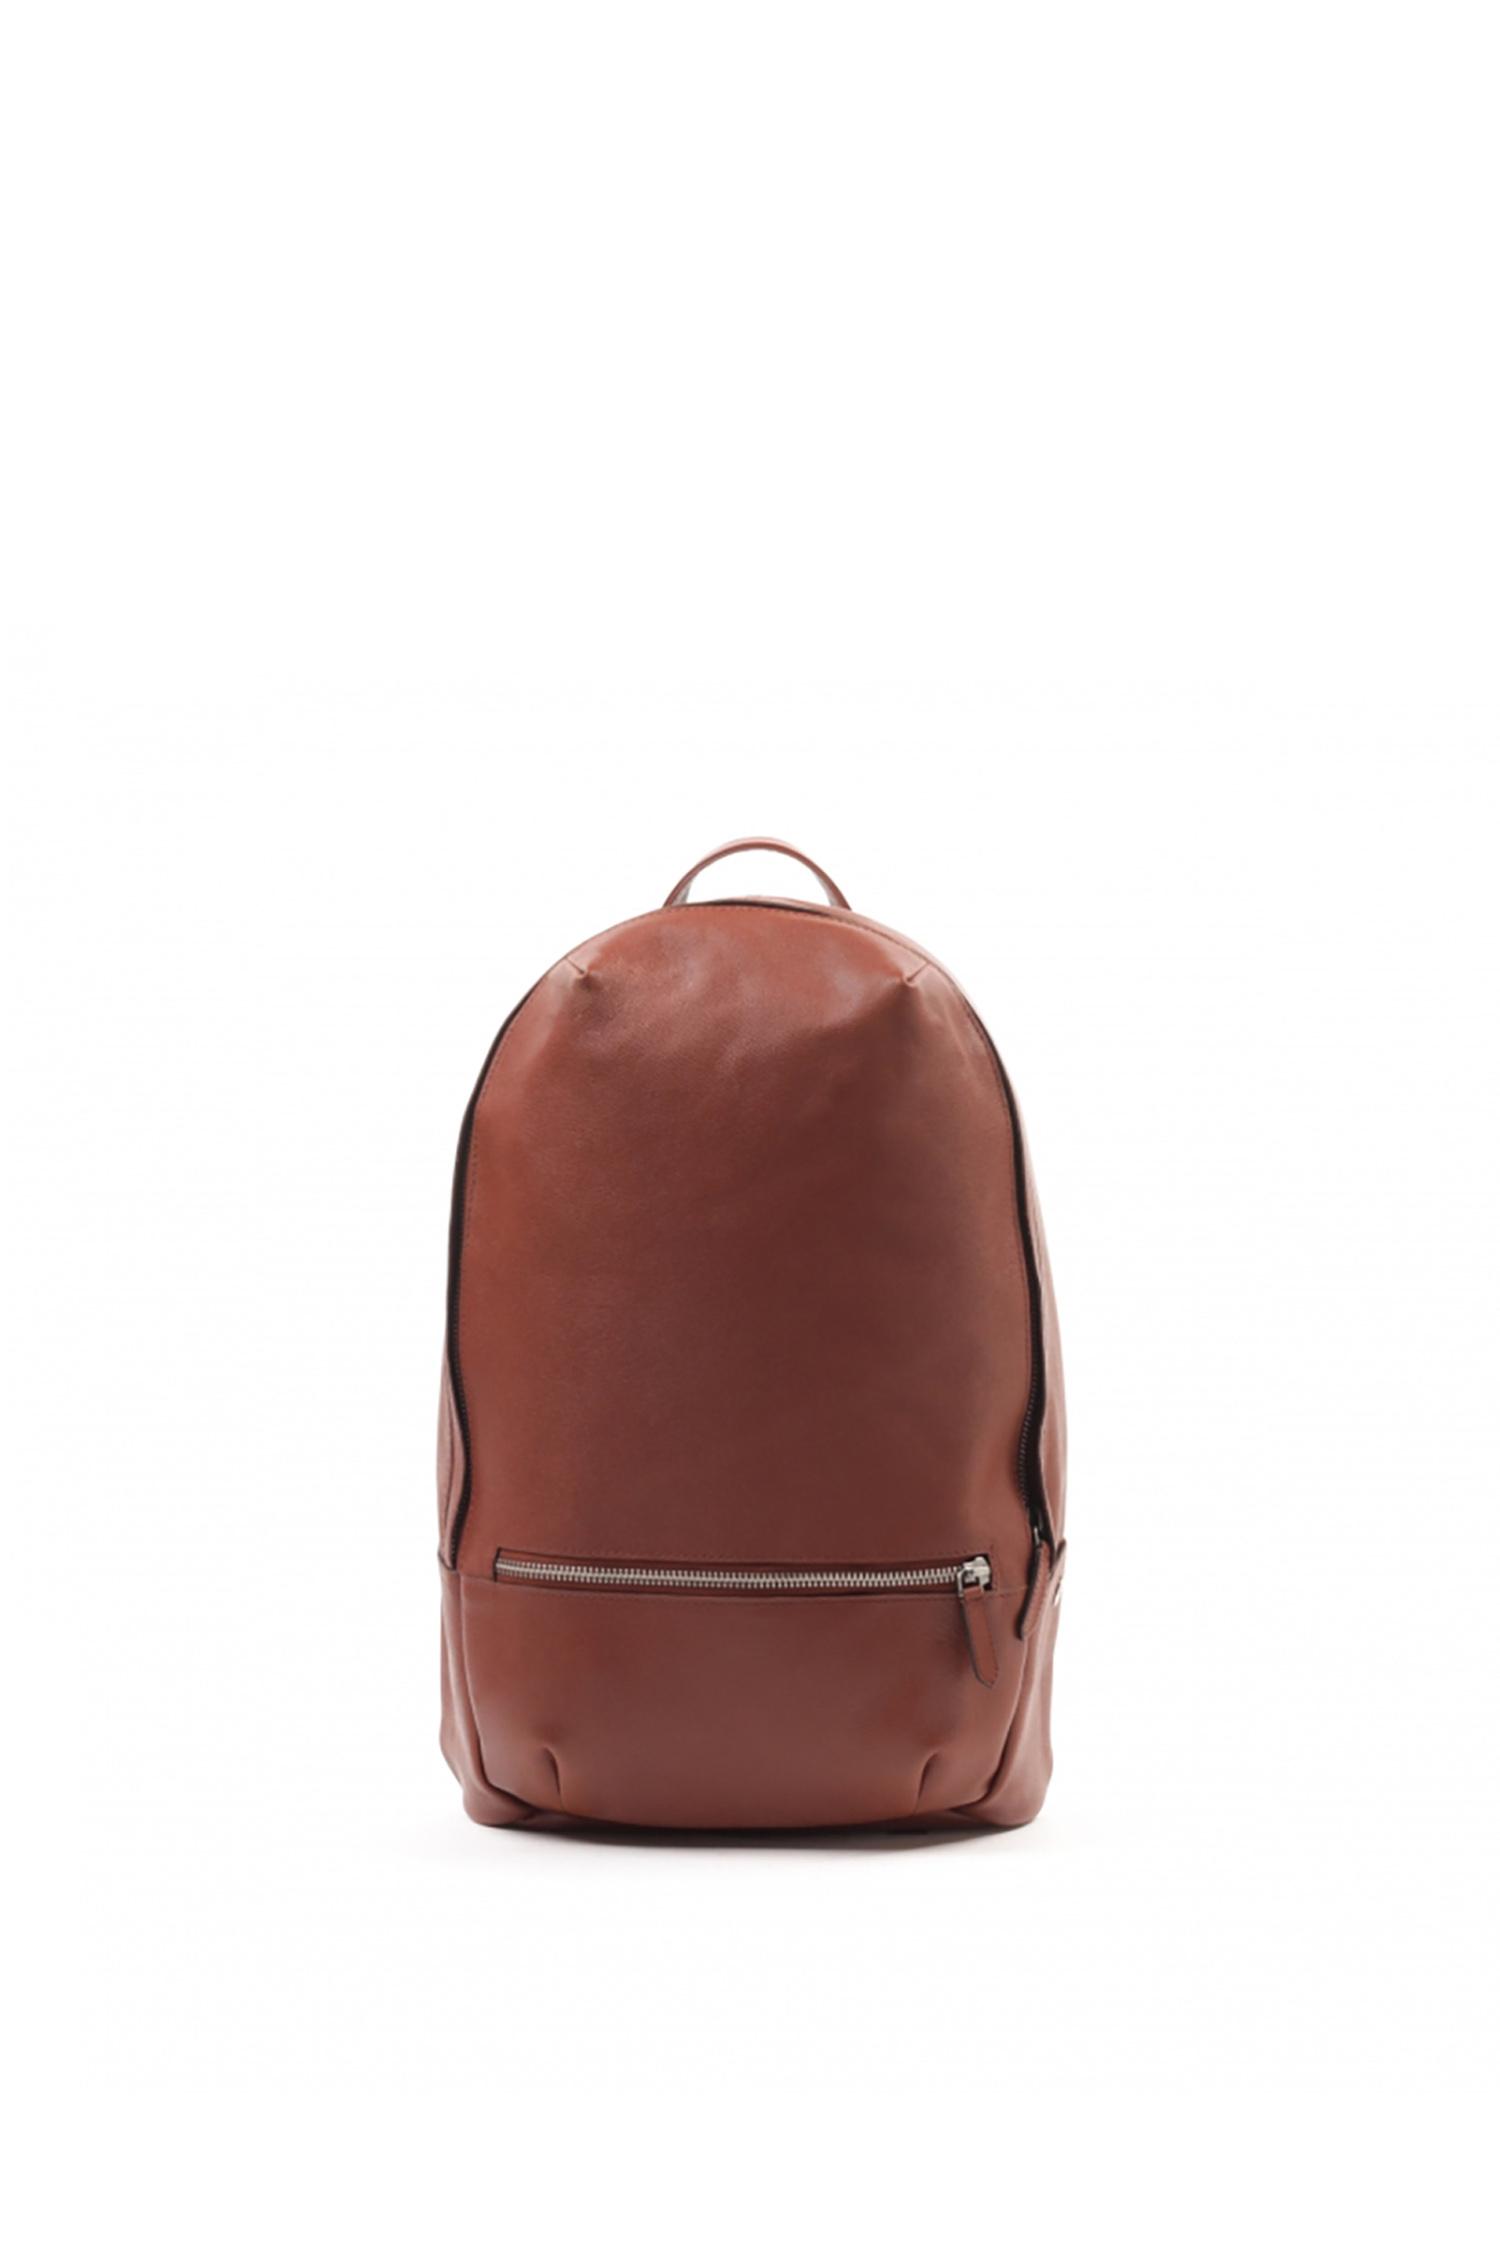 5883f500326 Royal Republiq Encore Backpack Mini, Tan 40% CHF 215.00 CHF 129.00